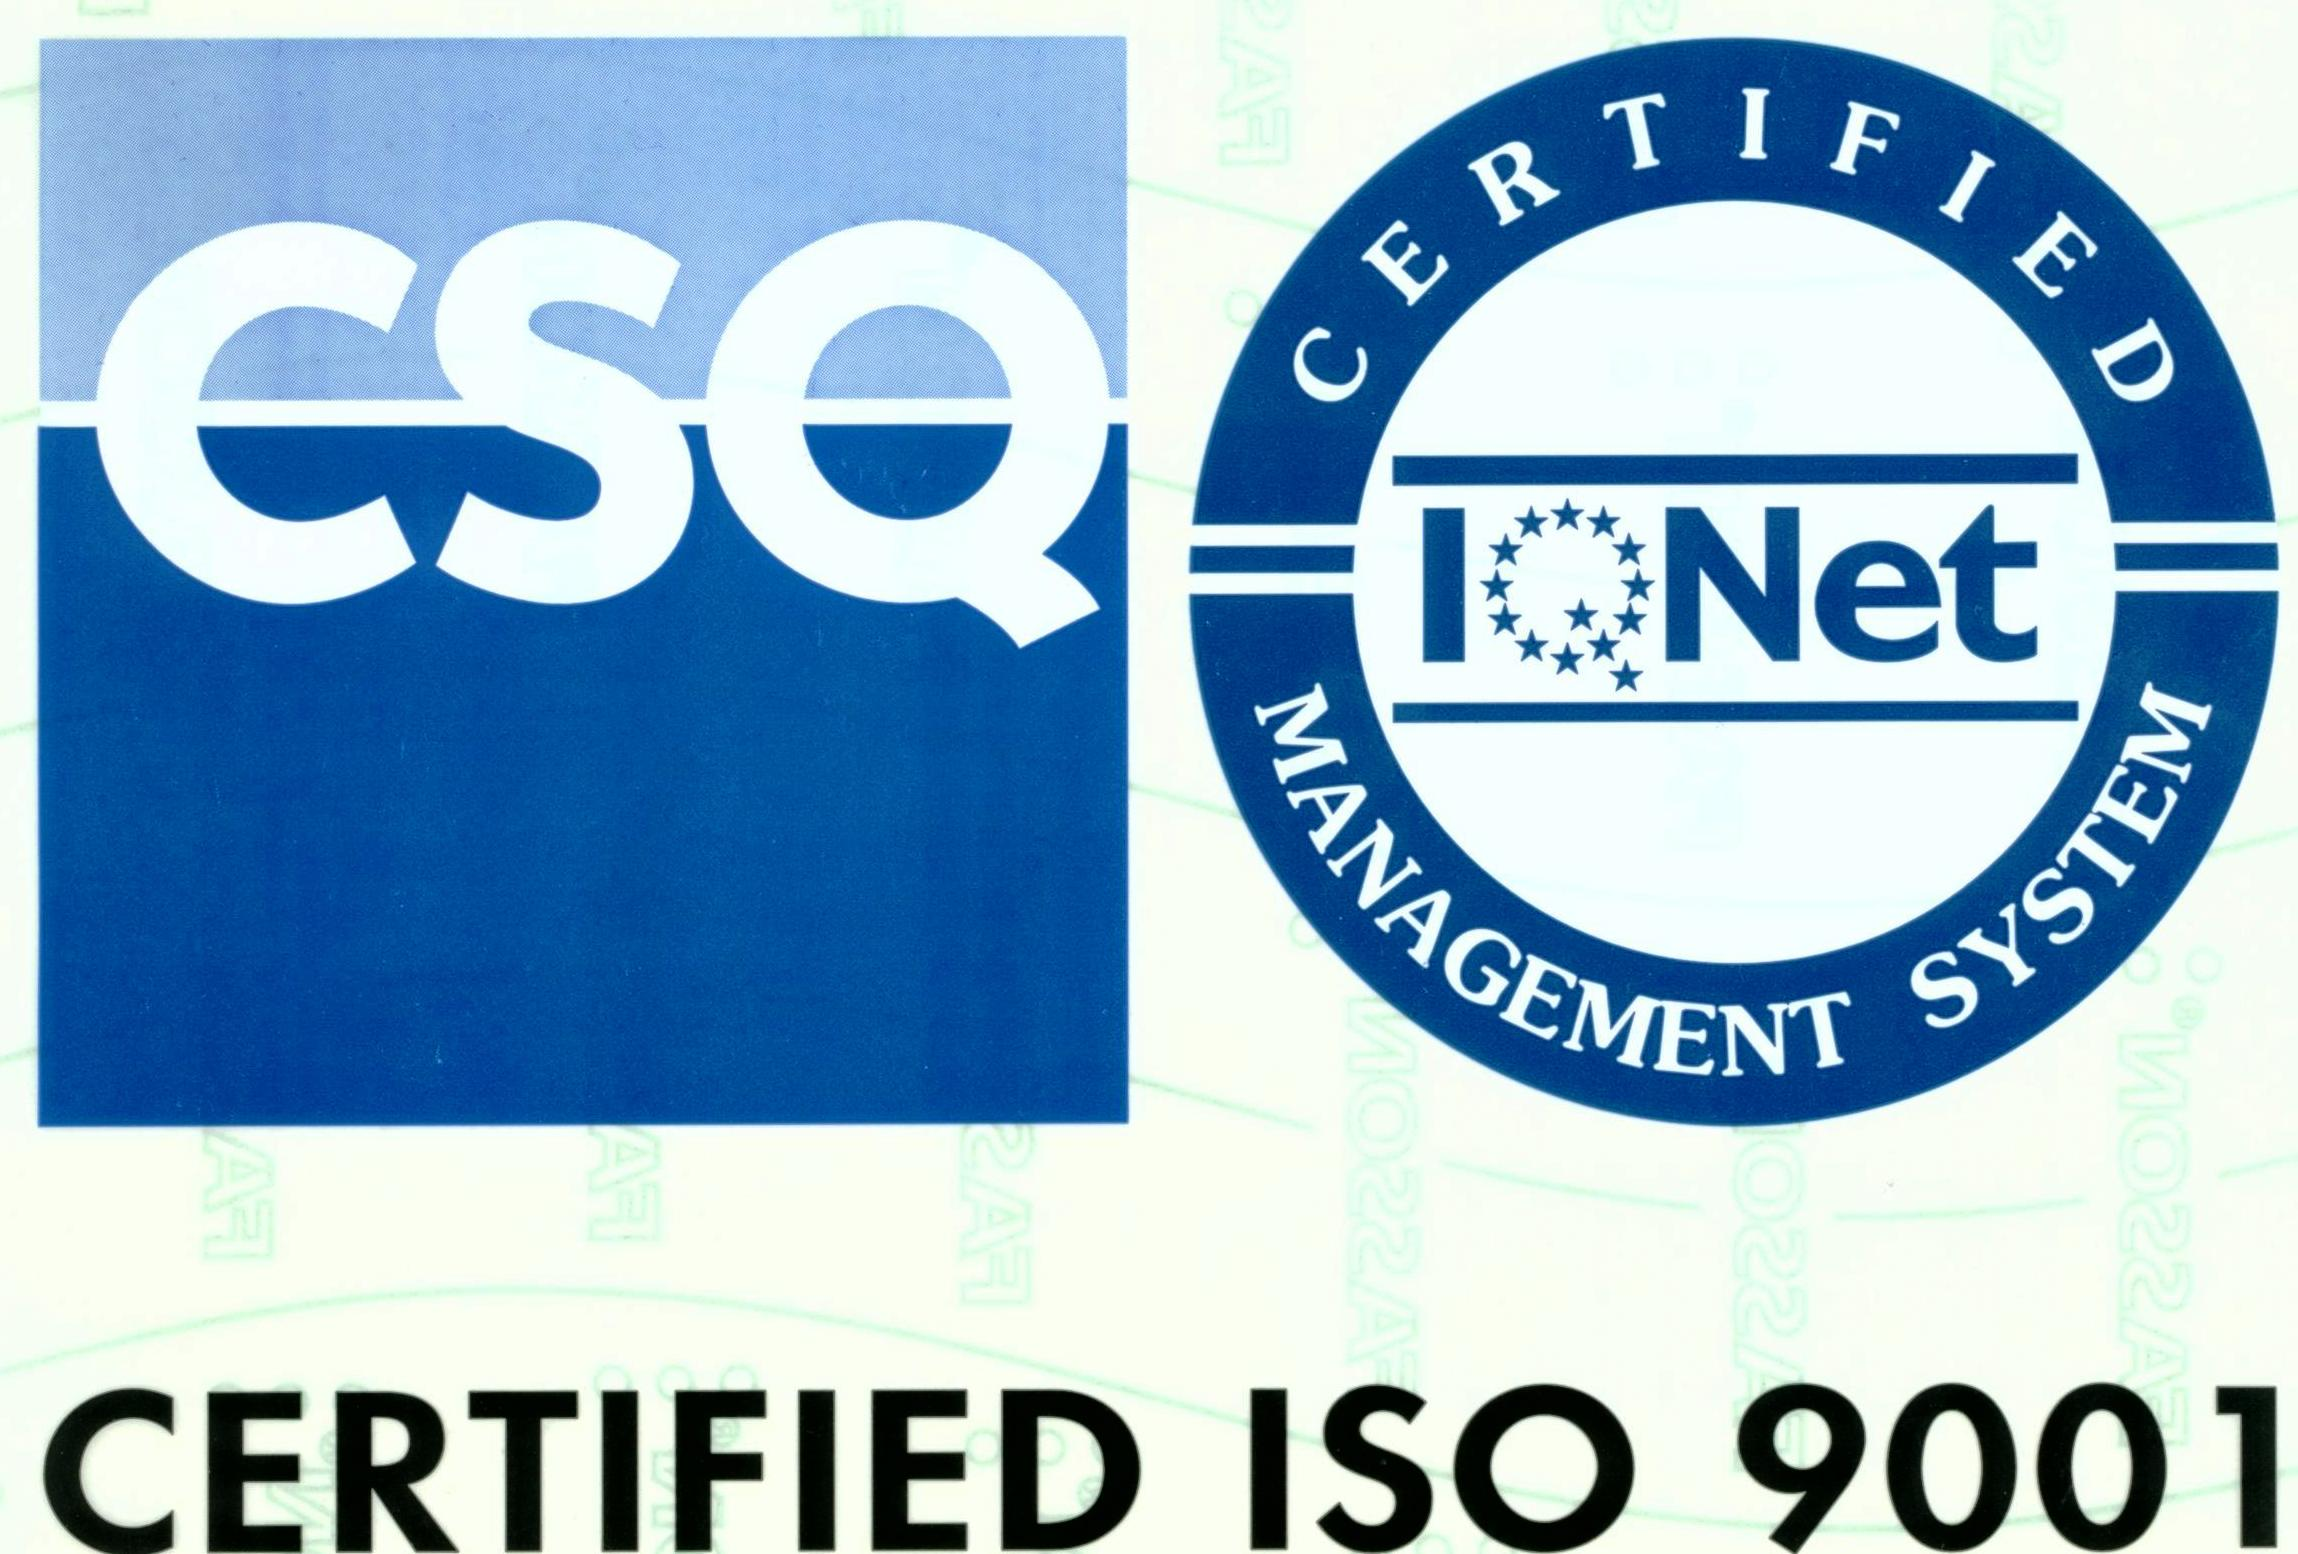 ISO9001 rivetta sistemi